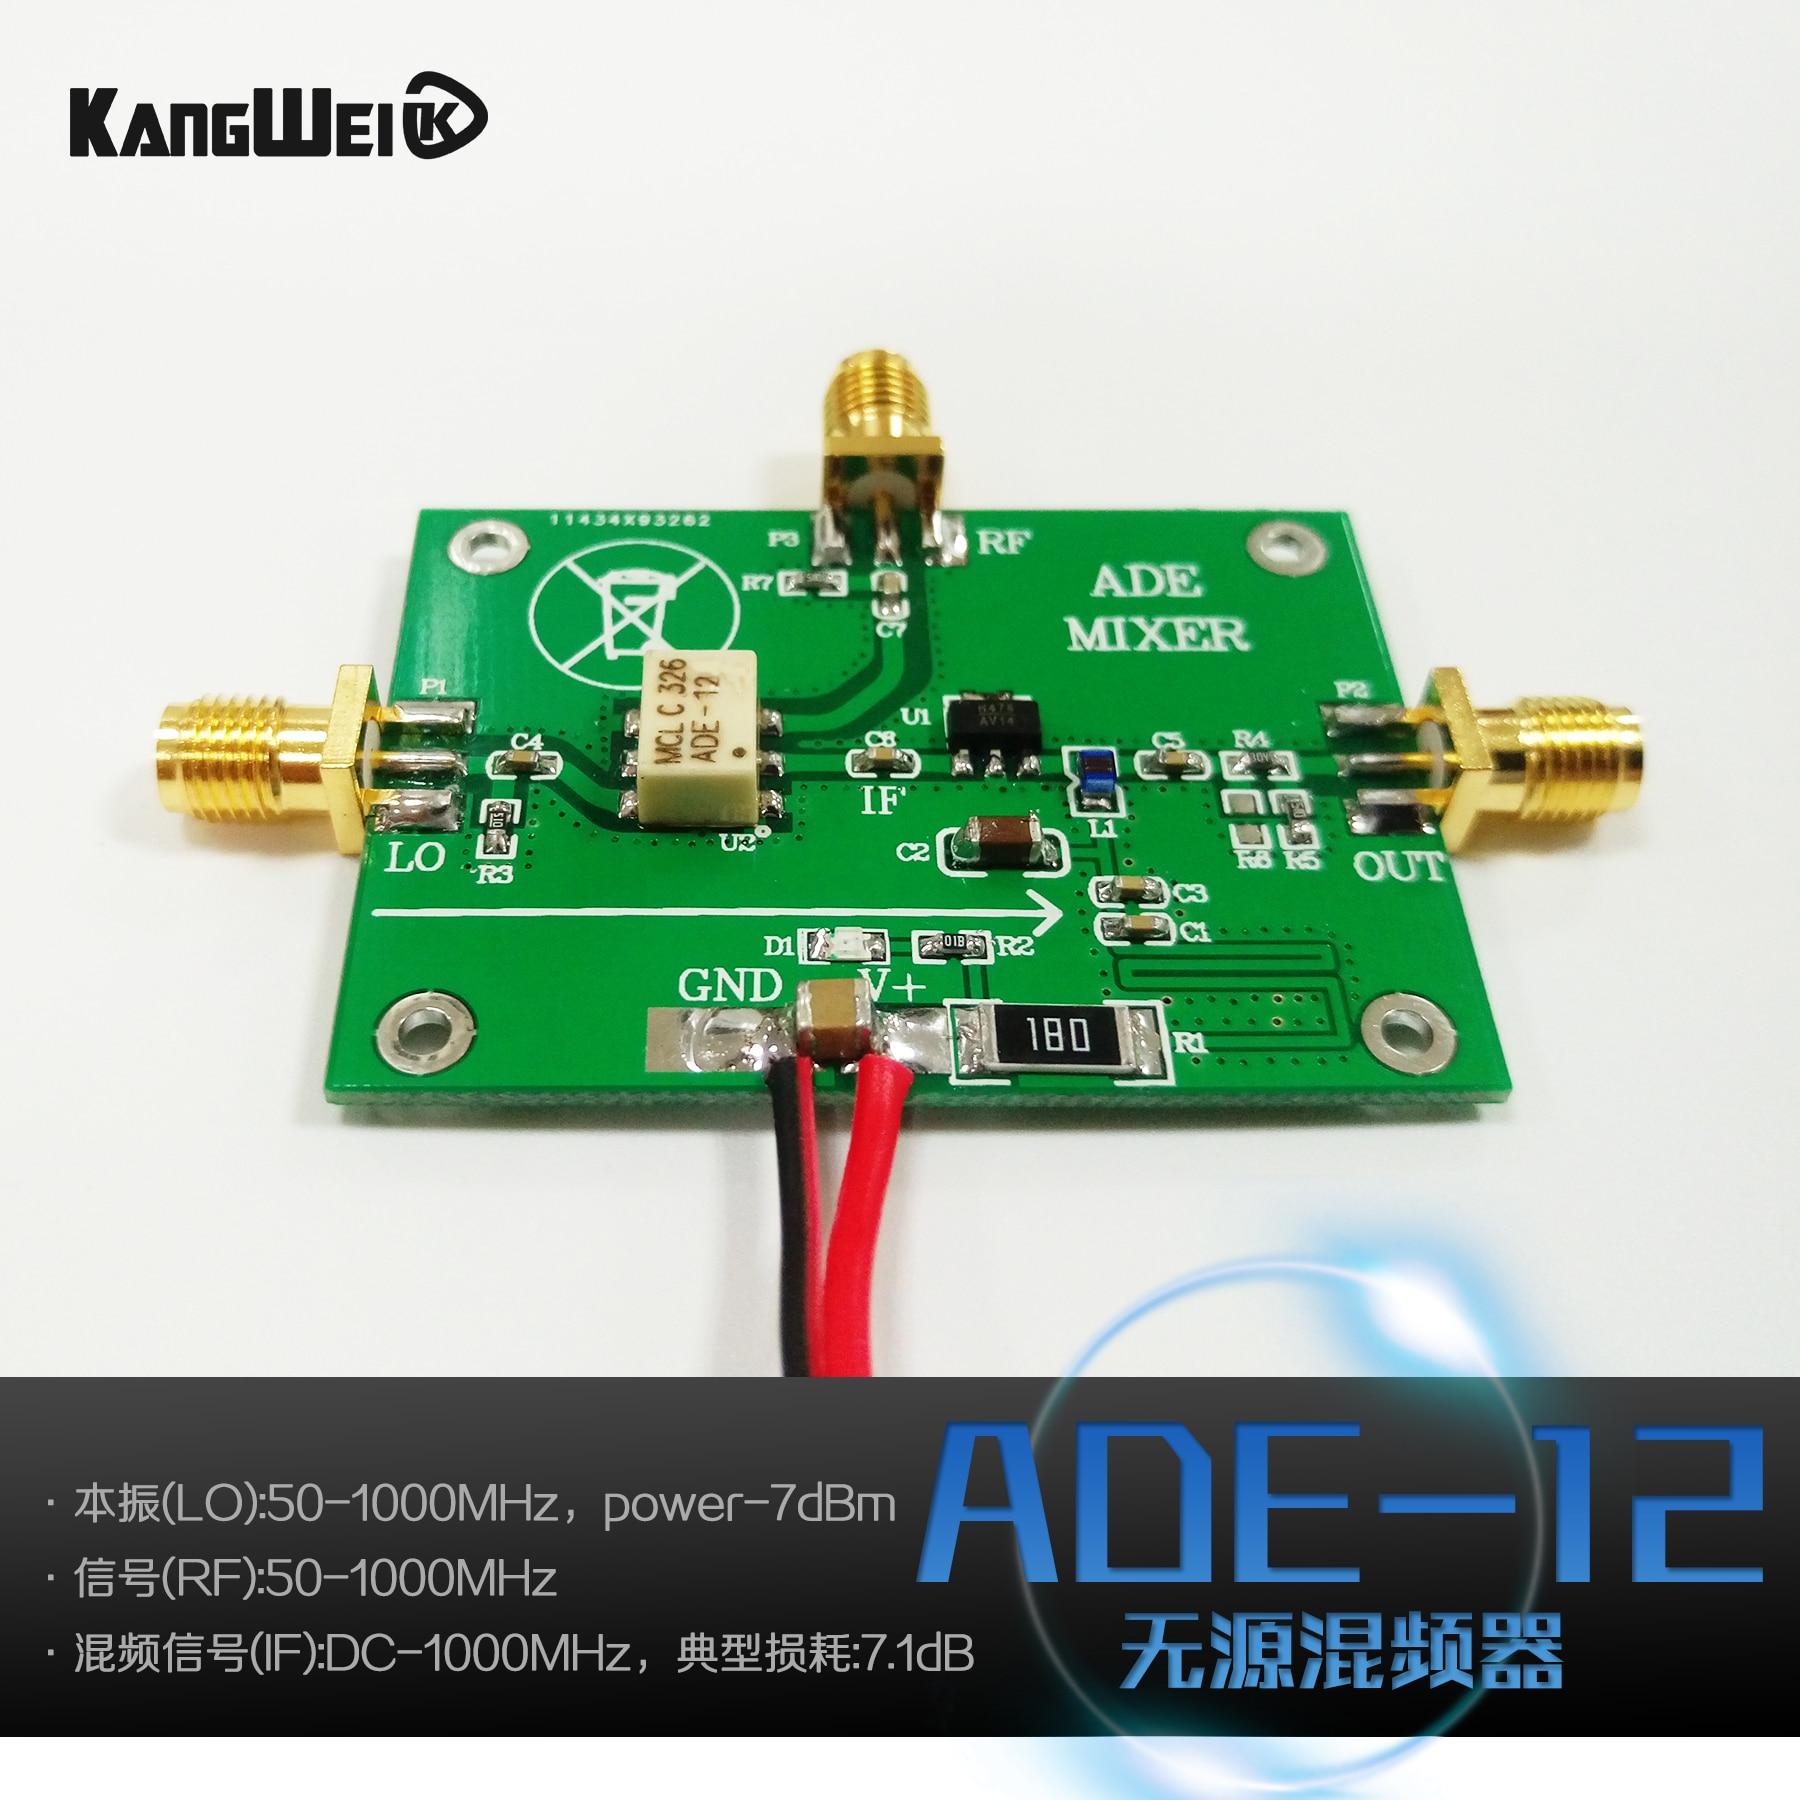 High Frequency Mixer, ADE-12H Passive Mixer Module, Conway Technology, 50MHz-1000MHz Mixer